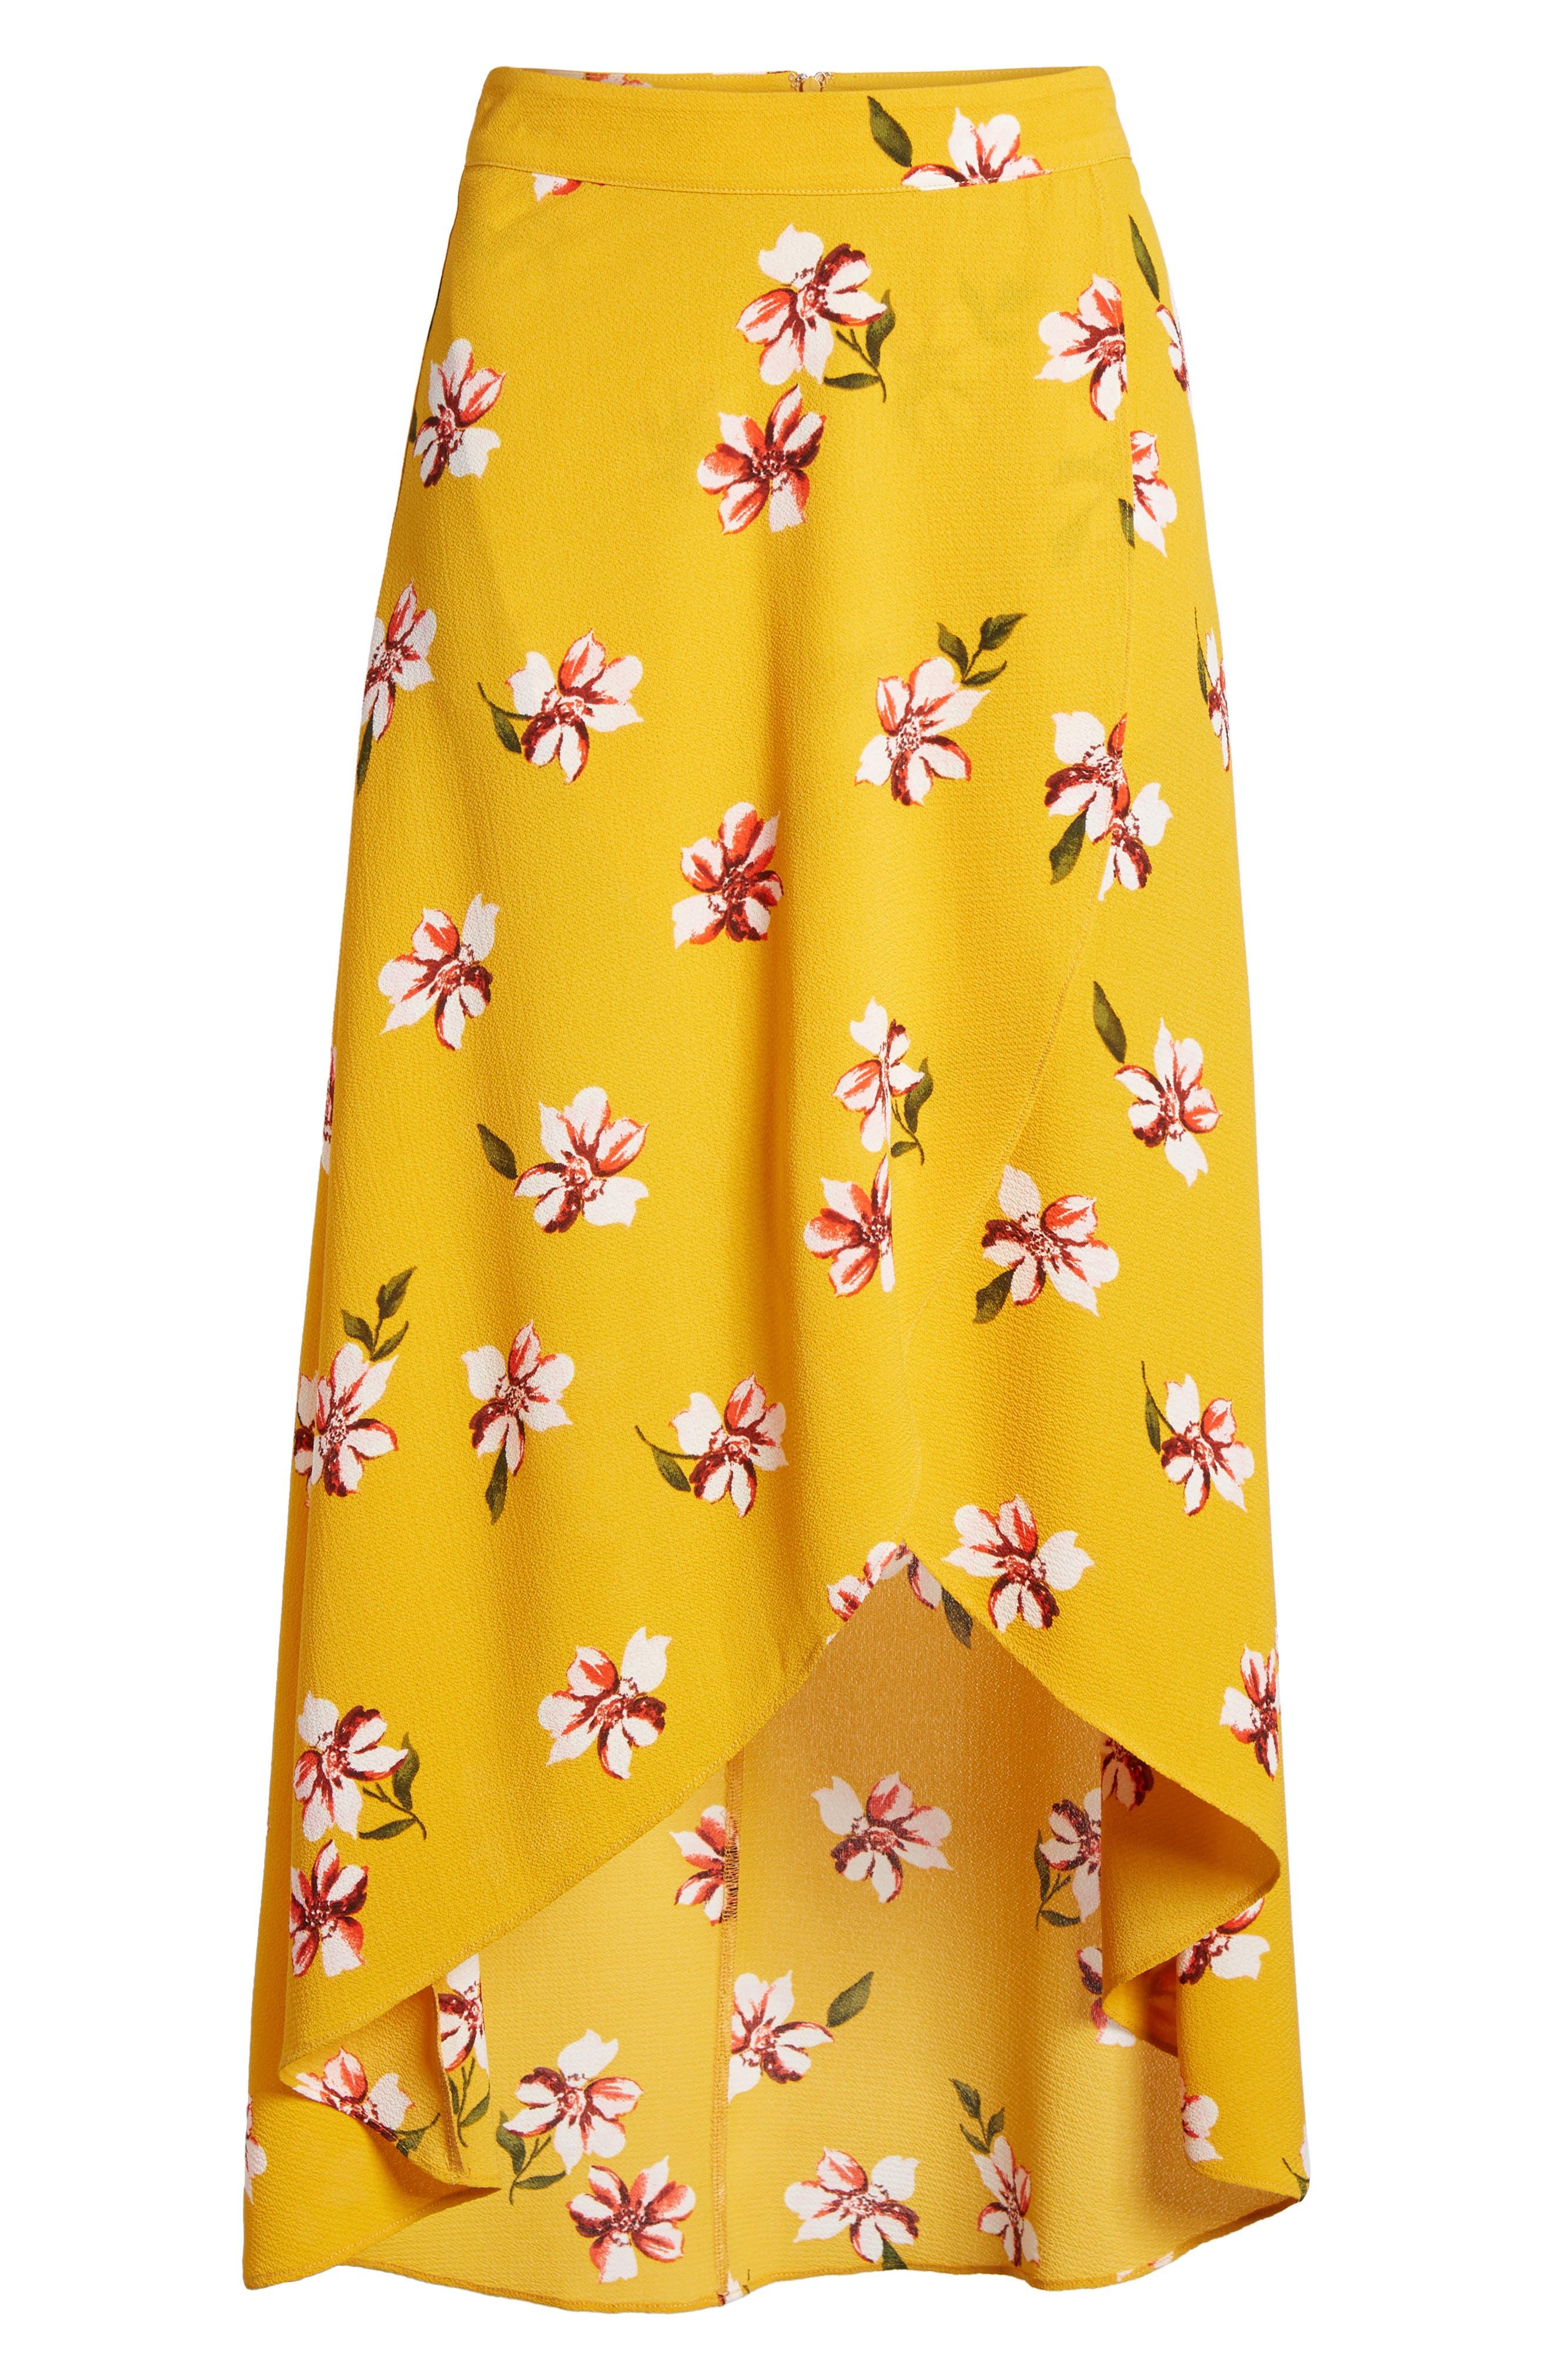 Floral Surplice Skirt,                             Alternate thumbnail 6, color,                             701